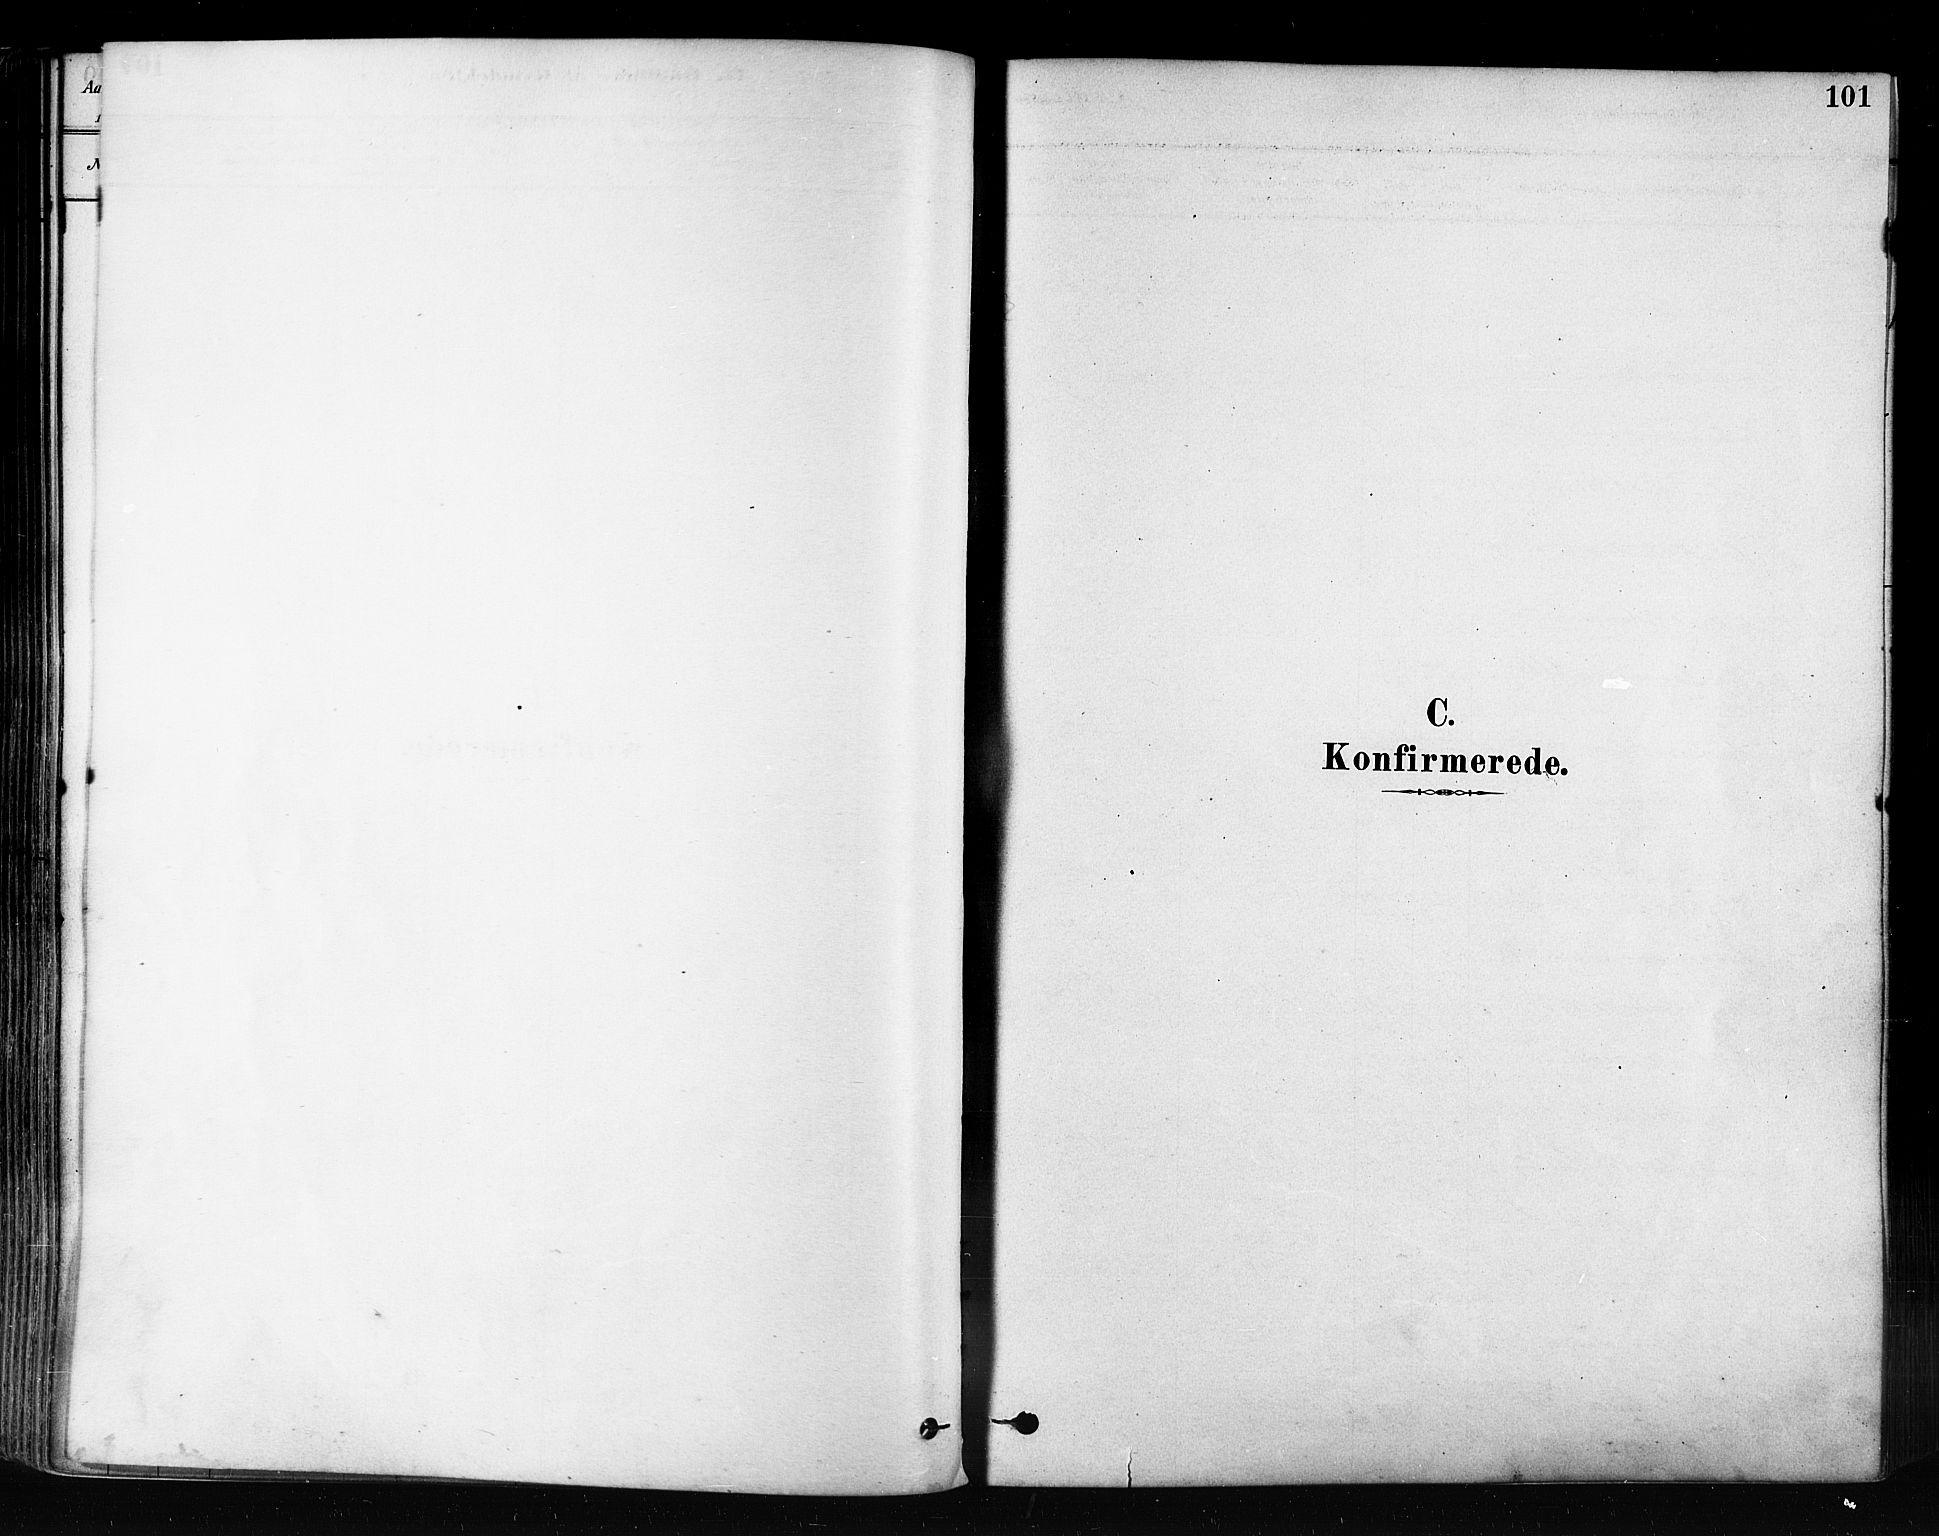 SATØ, Kautokeino sokneprestembete, H/Ha/L0004.kirke: Ministerialbok nr. 4, 1877-1896, s. 101